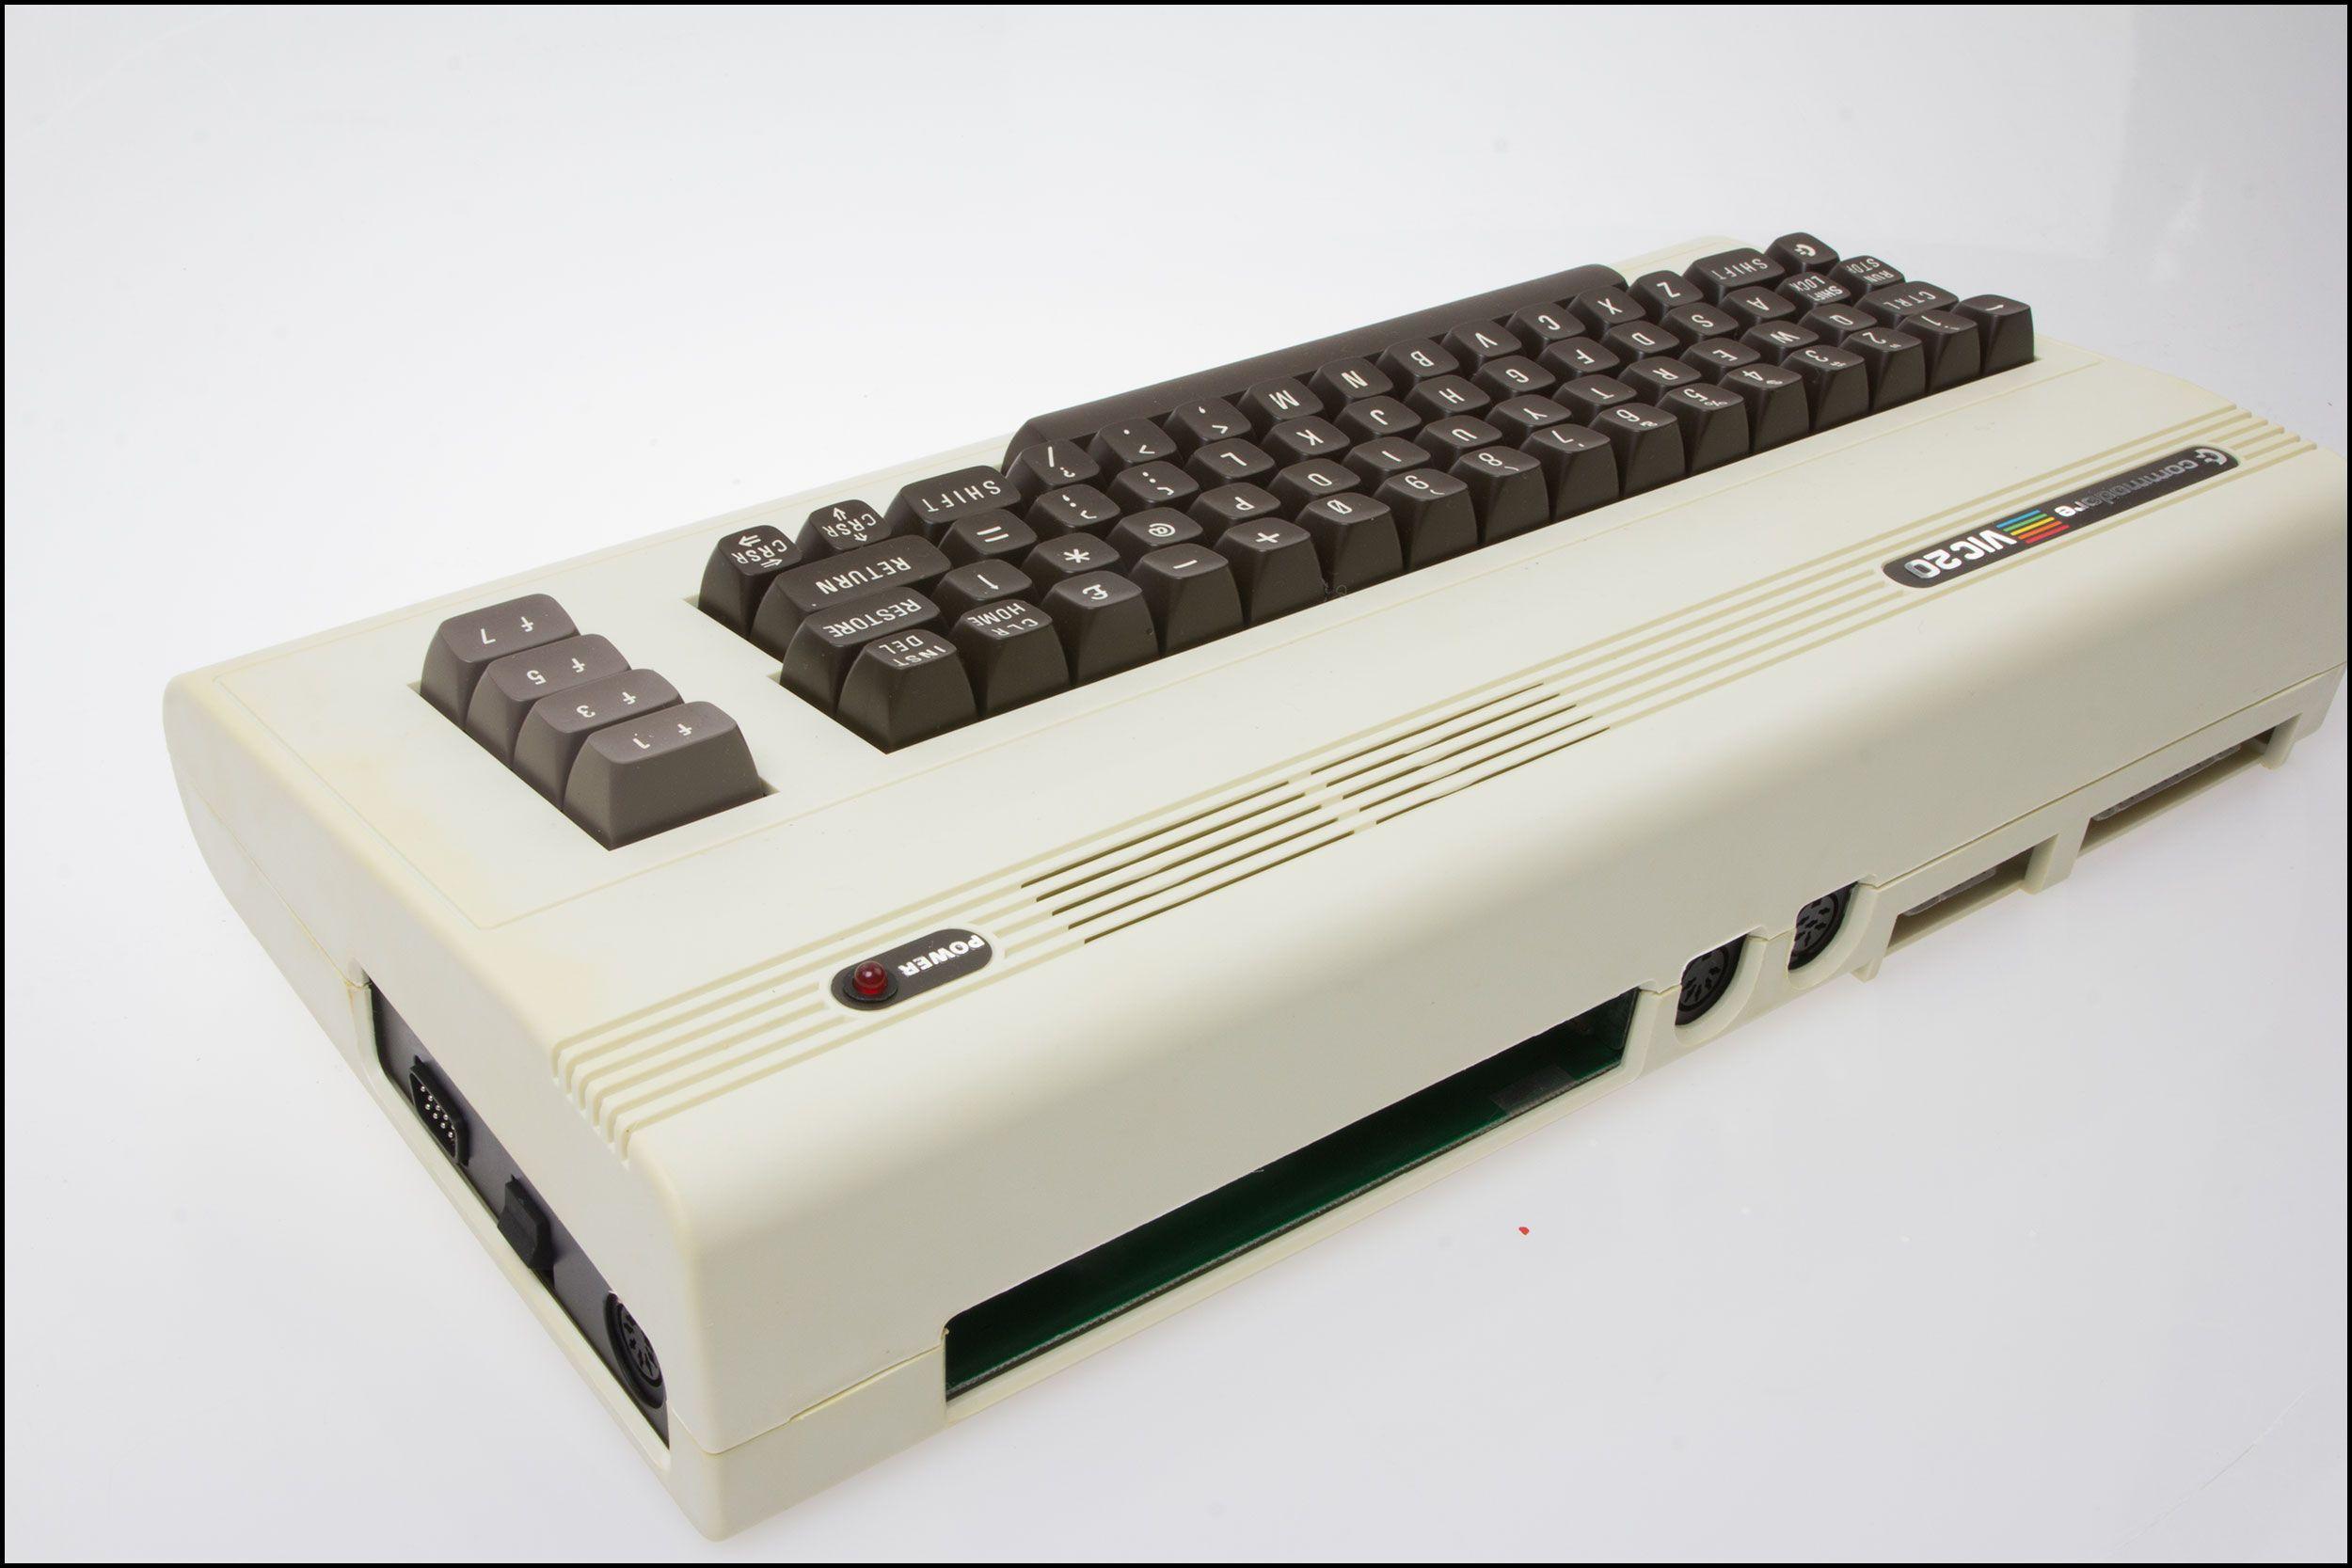 Commodore VIC 20 sett fra baksiden.Foto: Jørgen Elton Nilsen, Hardware.no